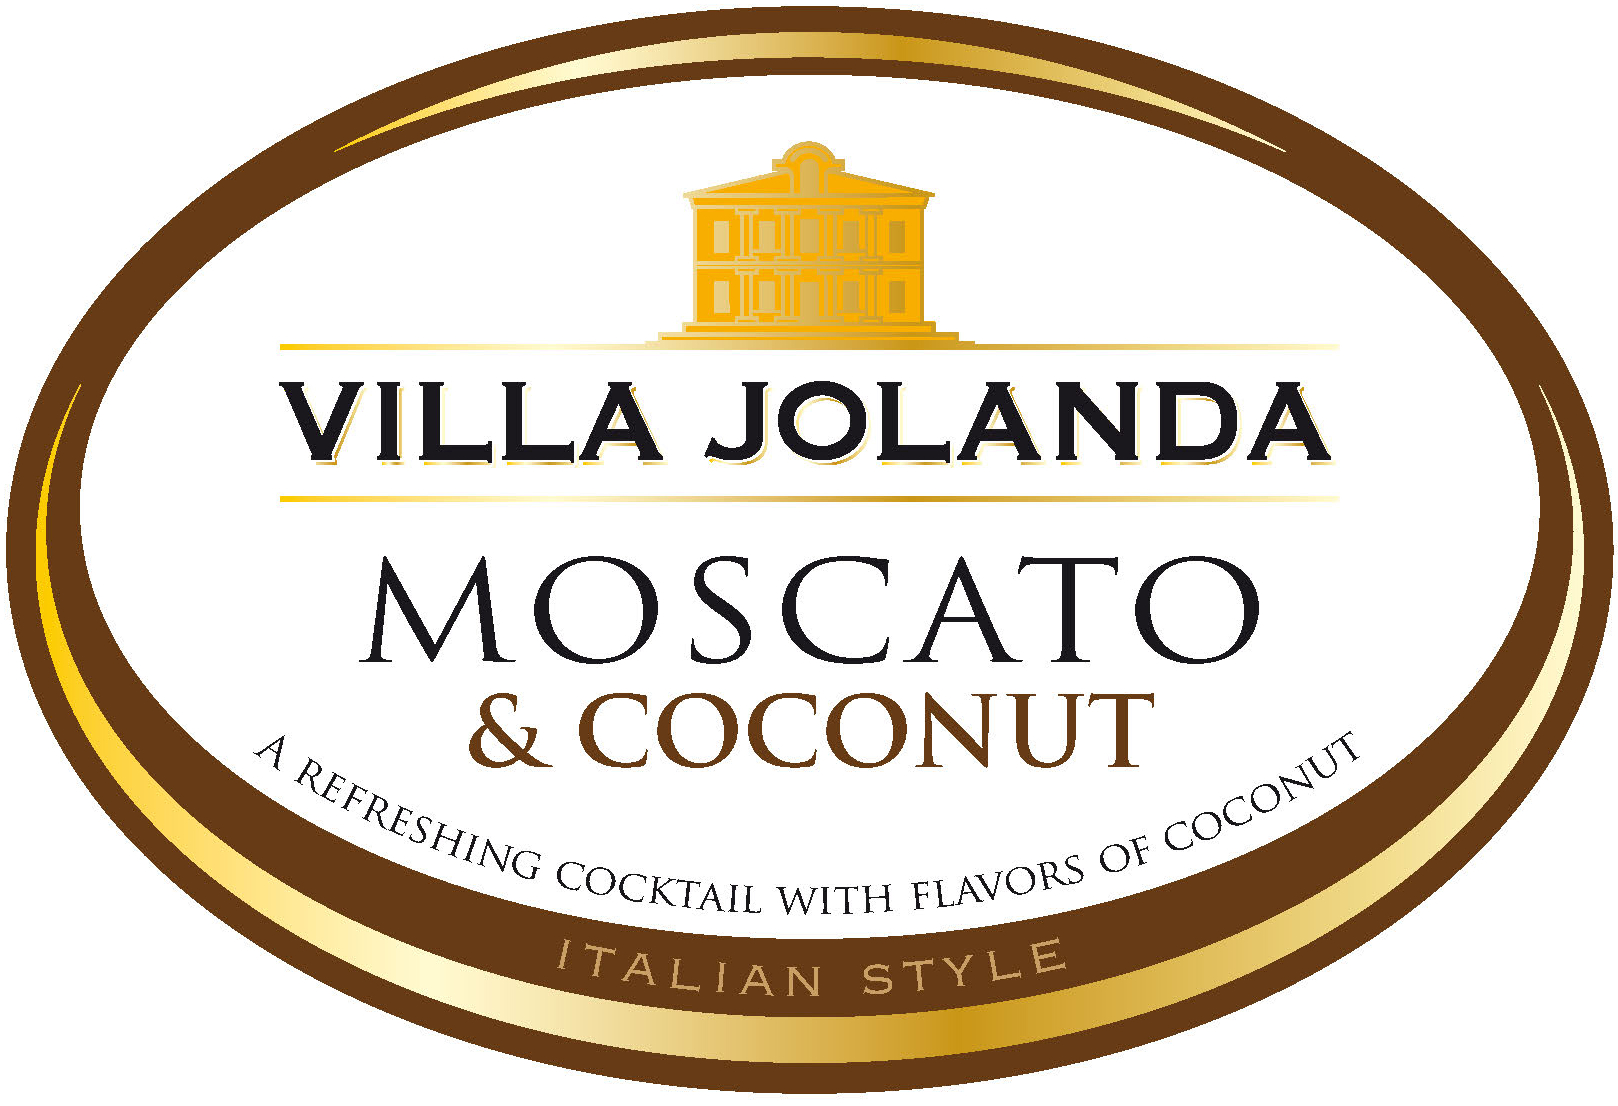 Villa Jolanda - Moscato and Coconut